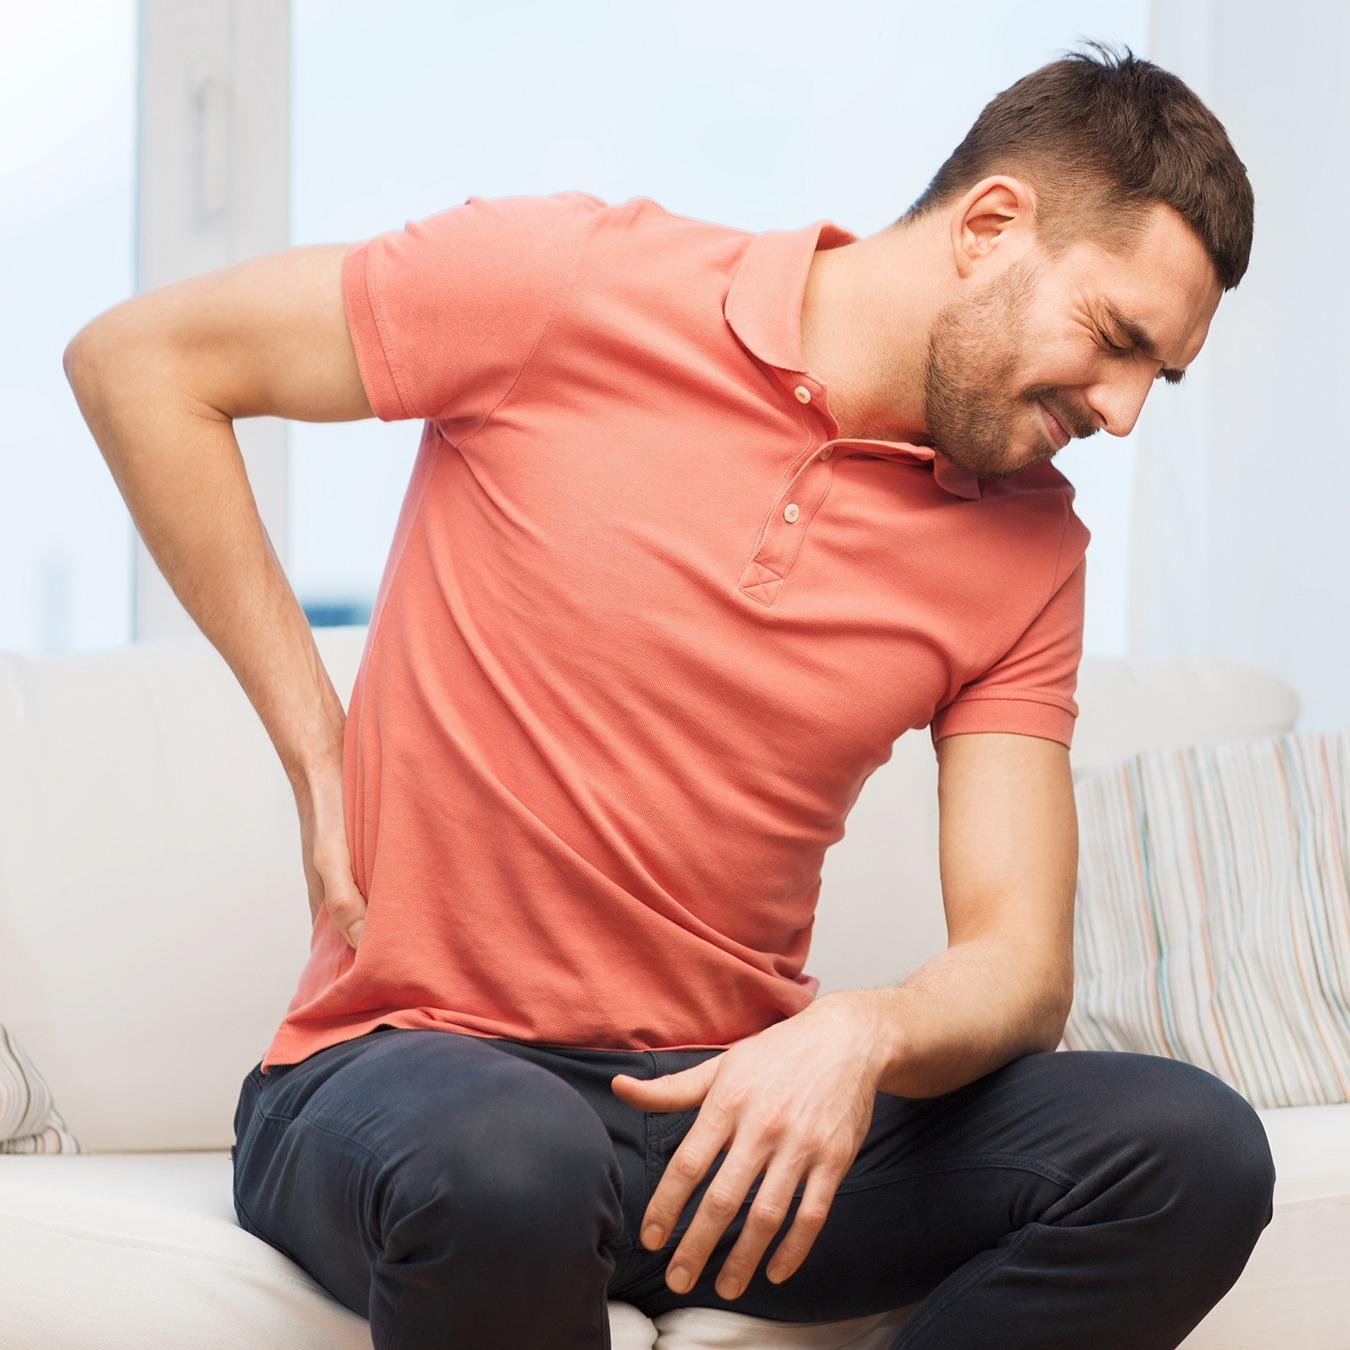 back pain man ThinkstockPhotos 511484476 square